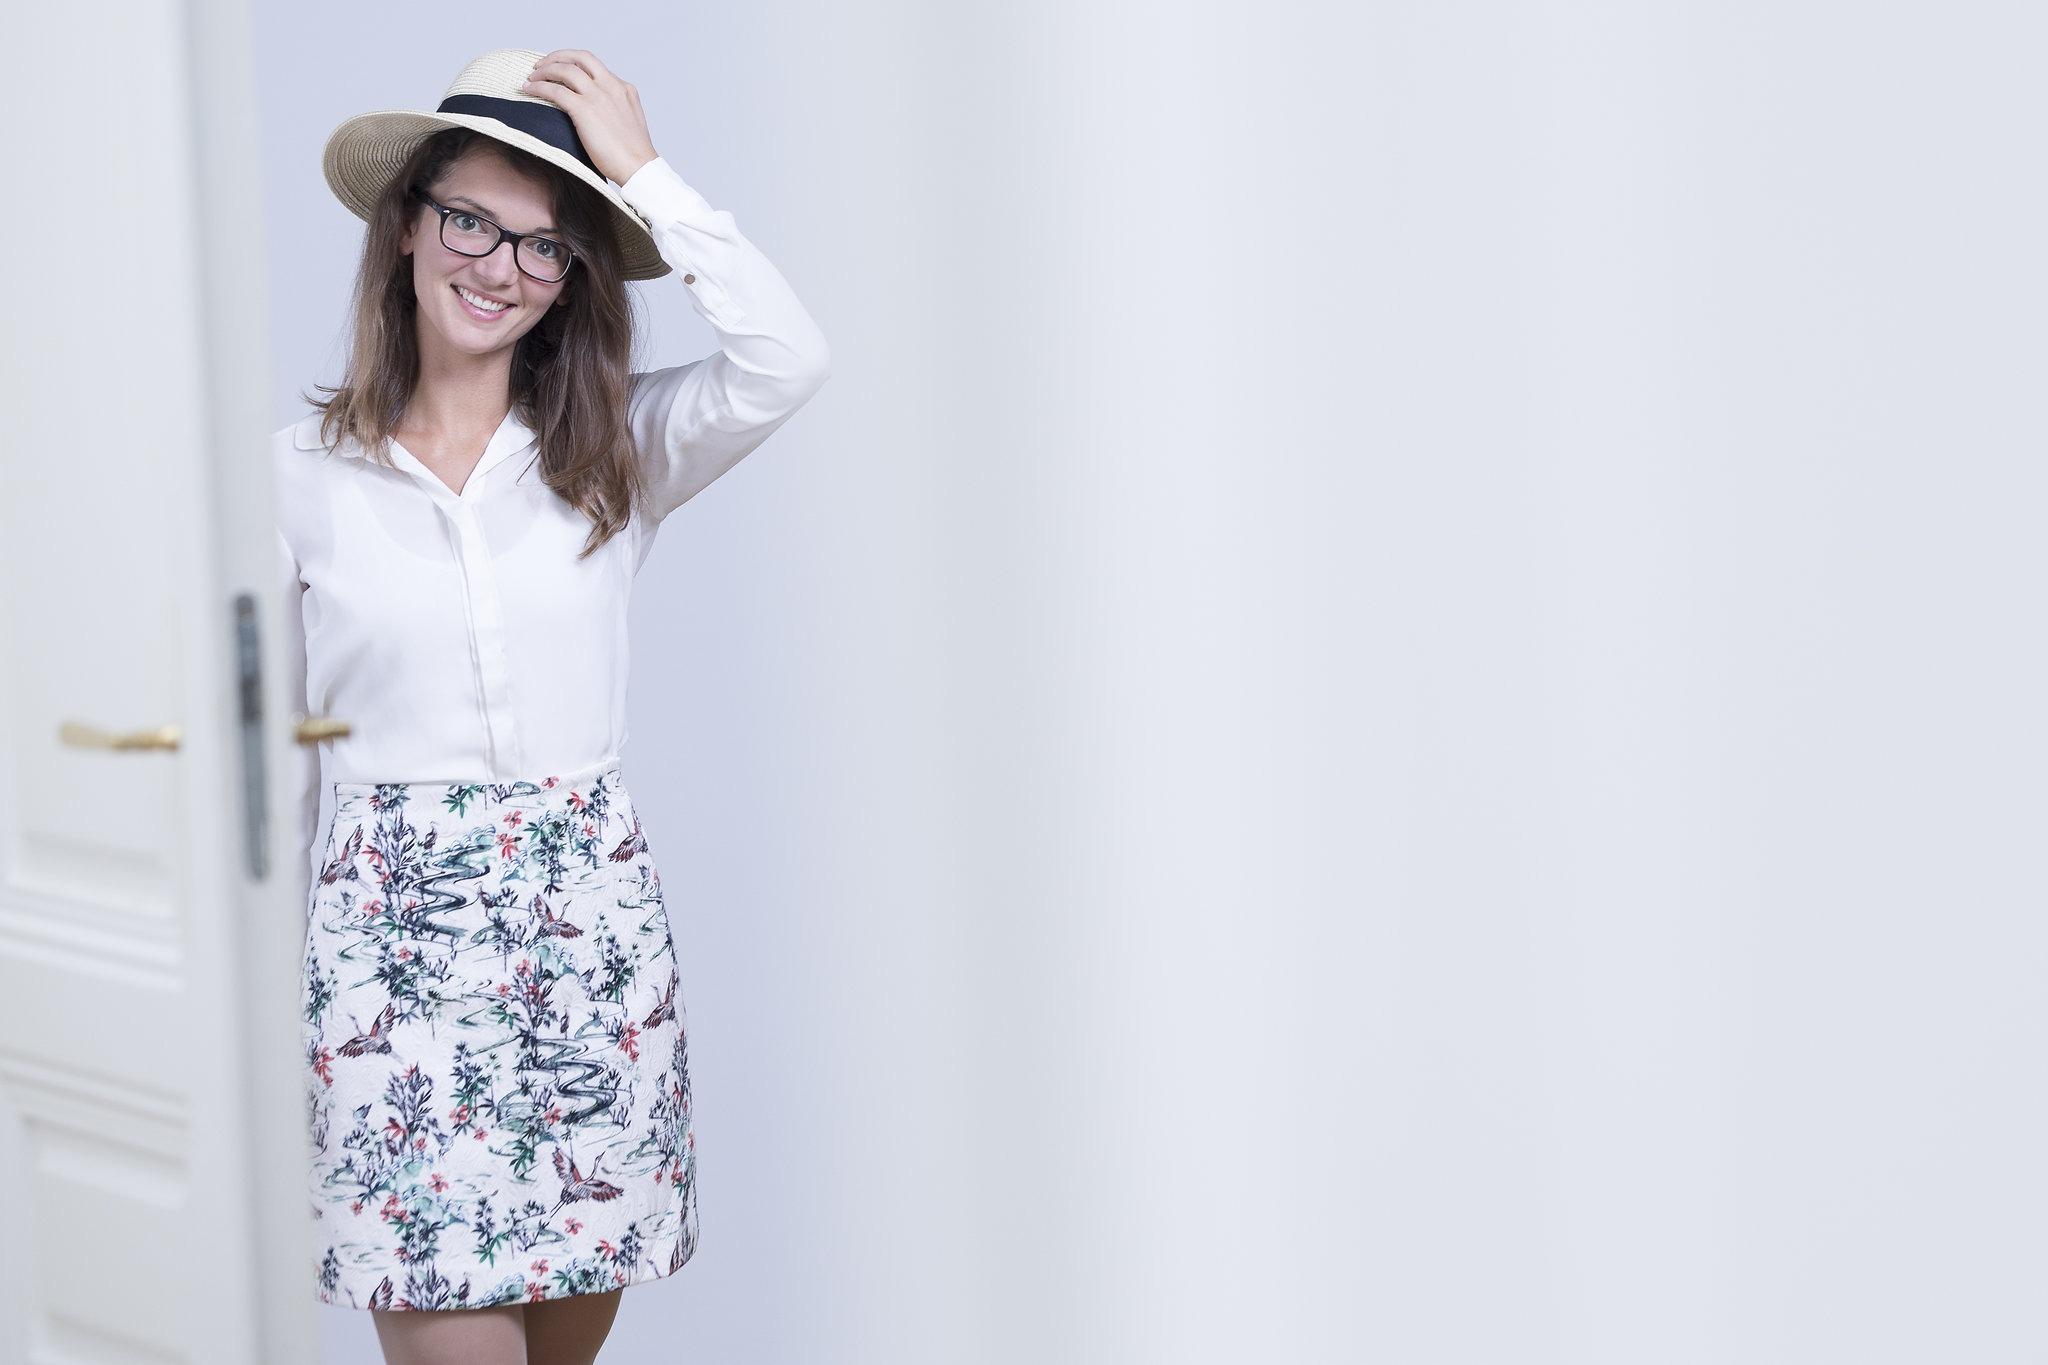 Blerta Huber Expertin 360-Grad-Feedback